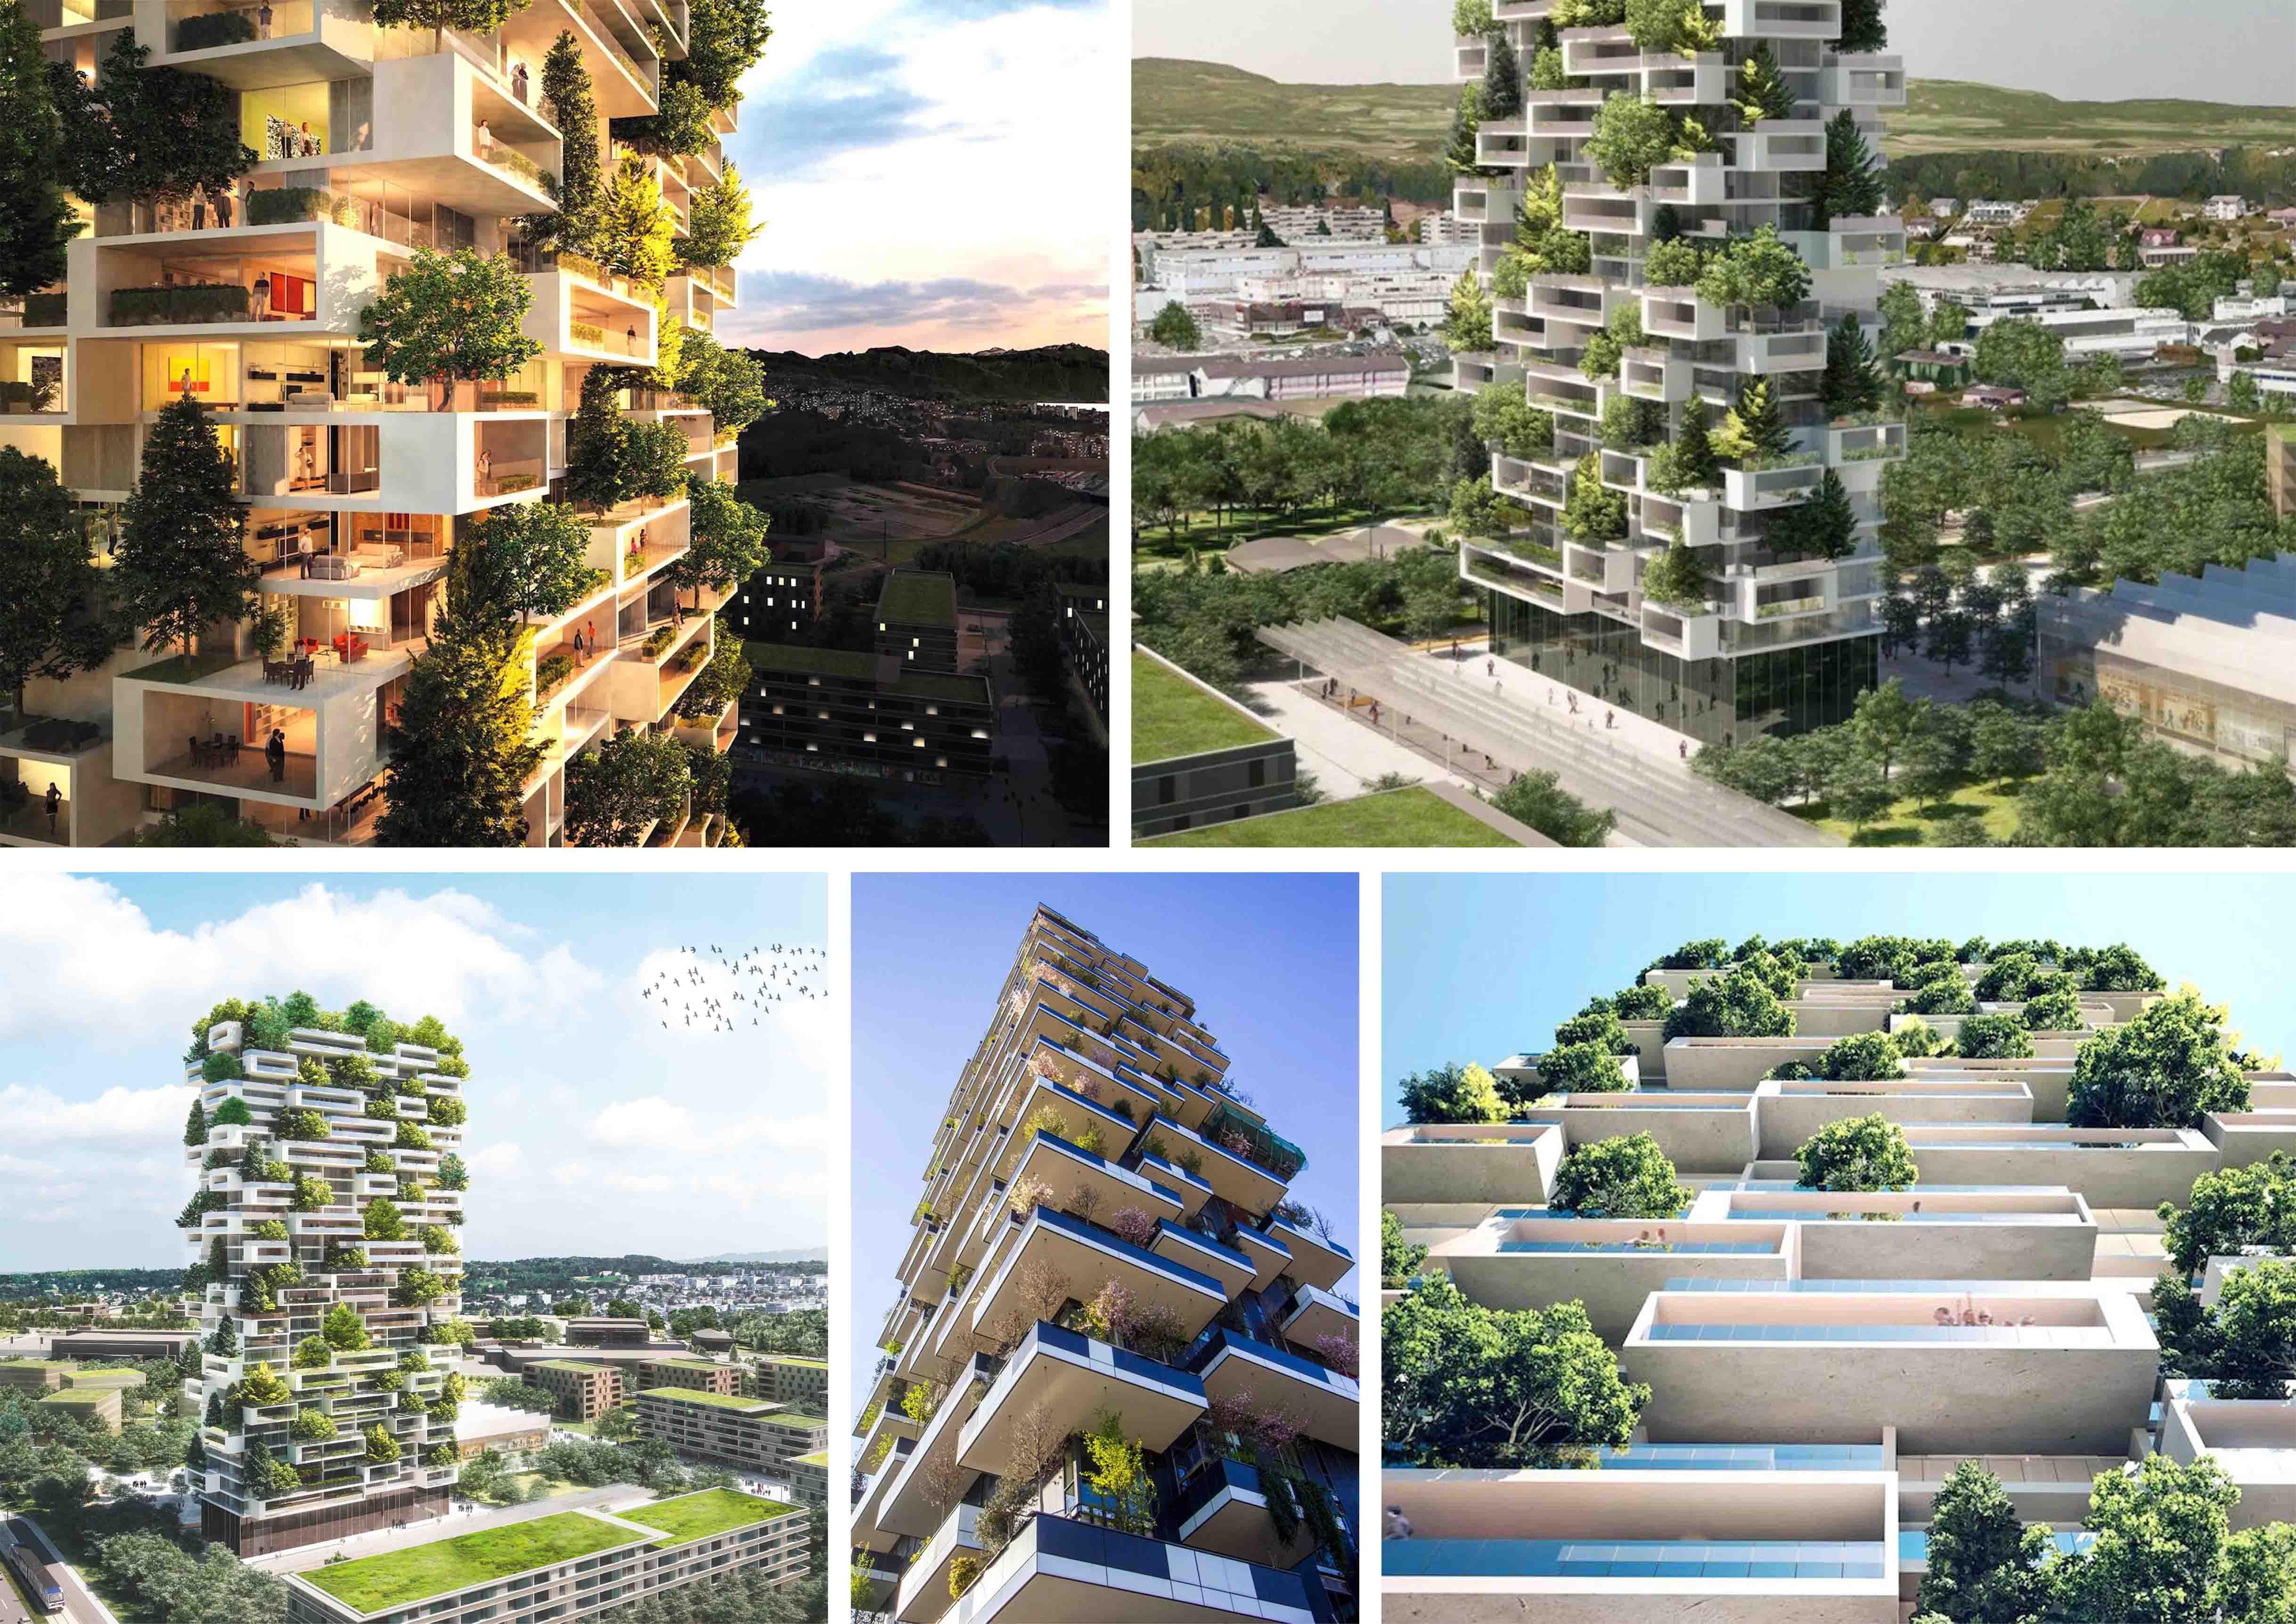 svizzera green architecture